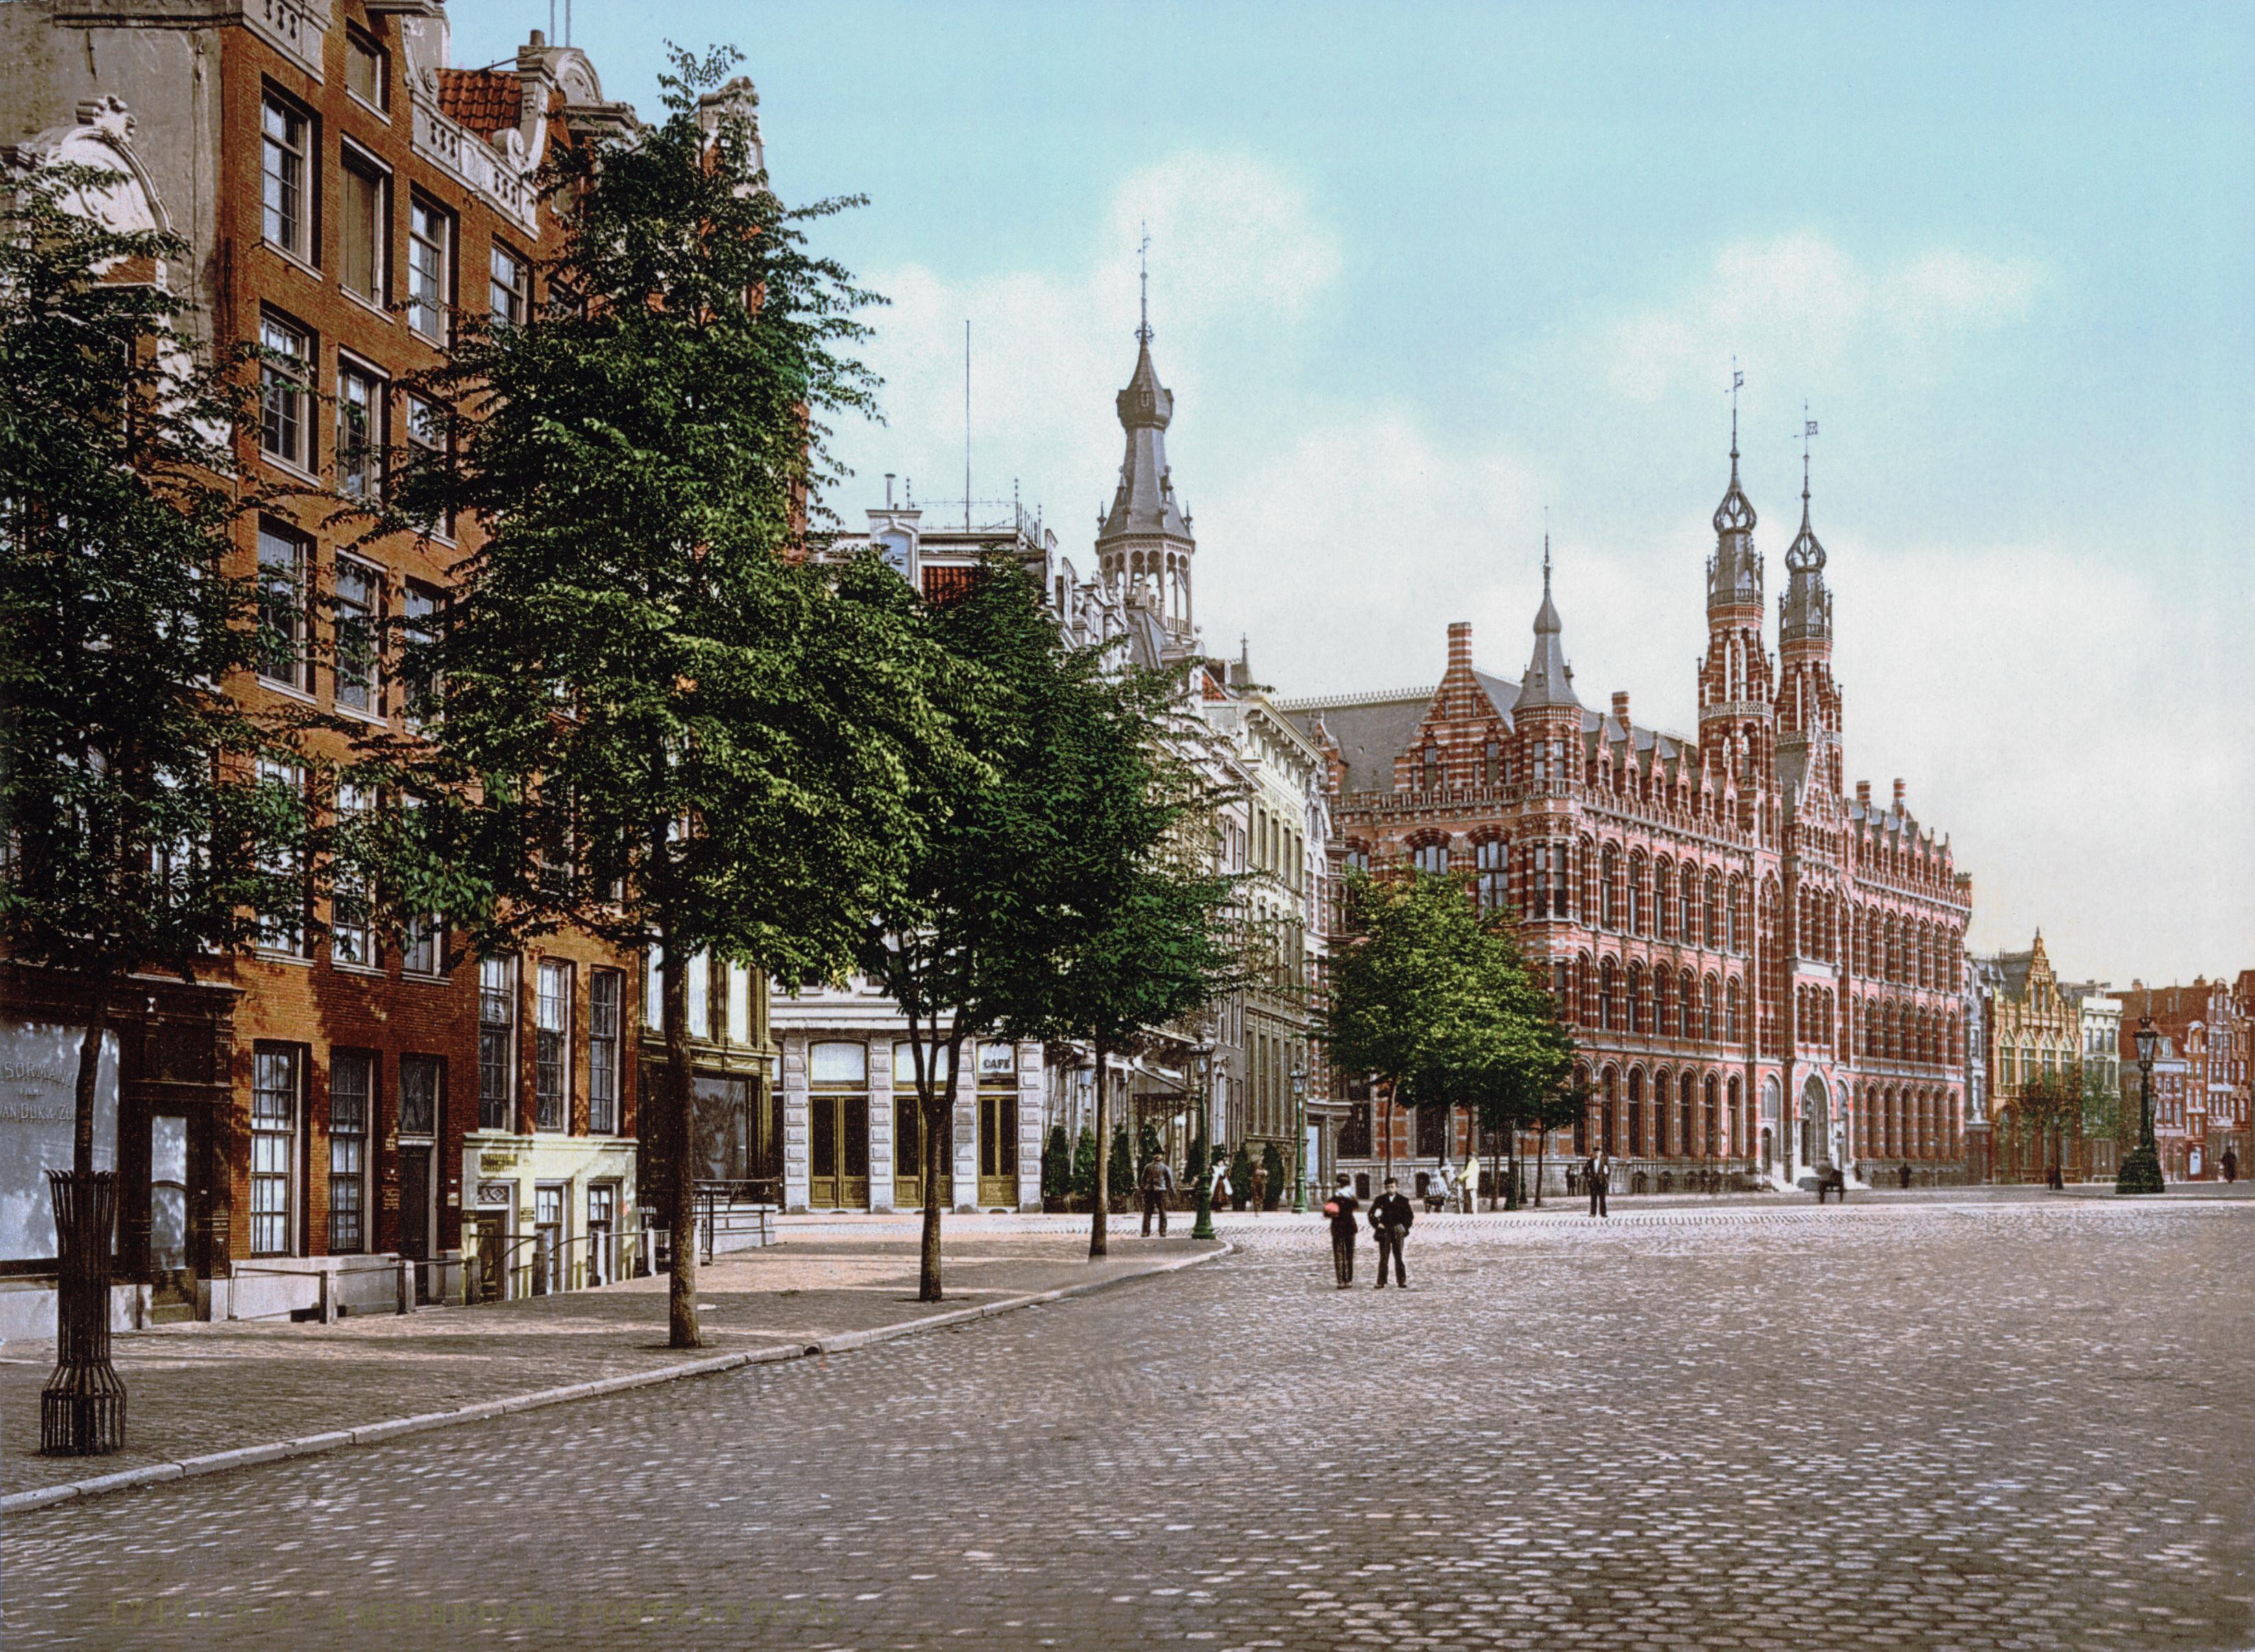 Postkantoor Amsterdam